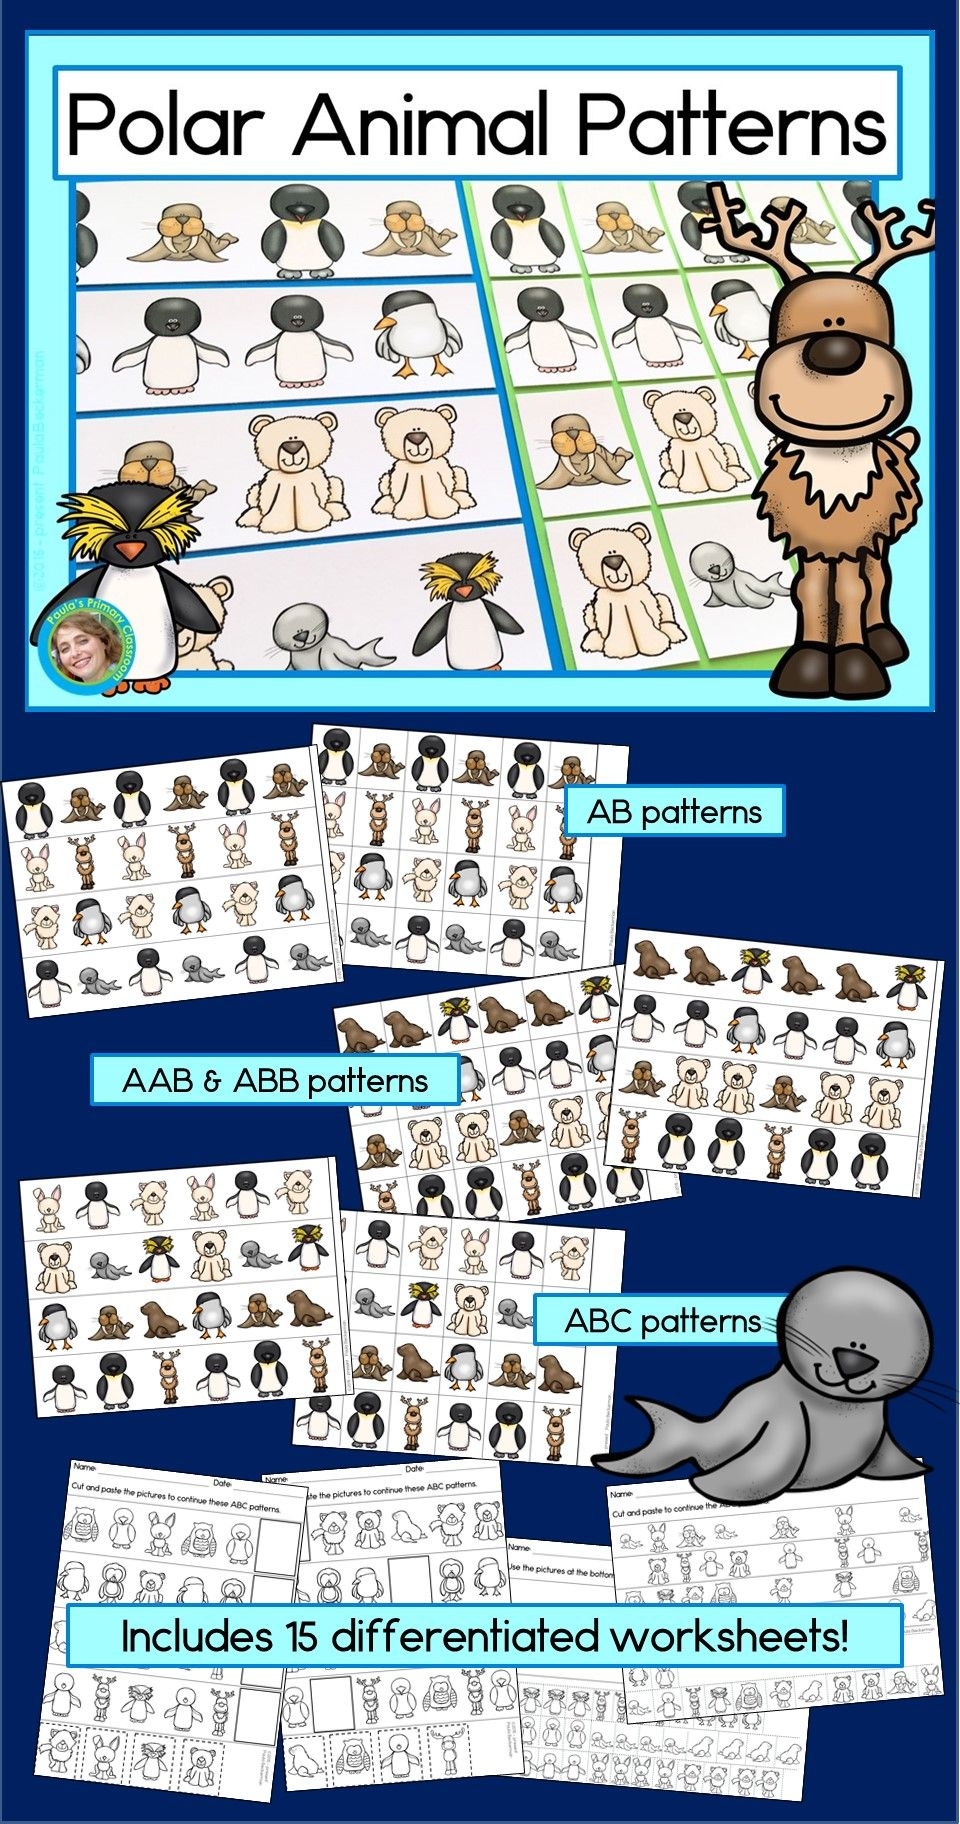 Polar Animal Patterns Math Center With Ab Abc Aab Abb Patterns Polar Animals Abb Patterns Stuffed Animal Patterns